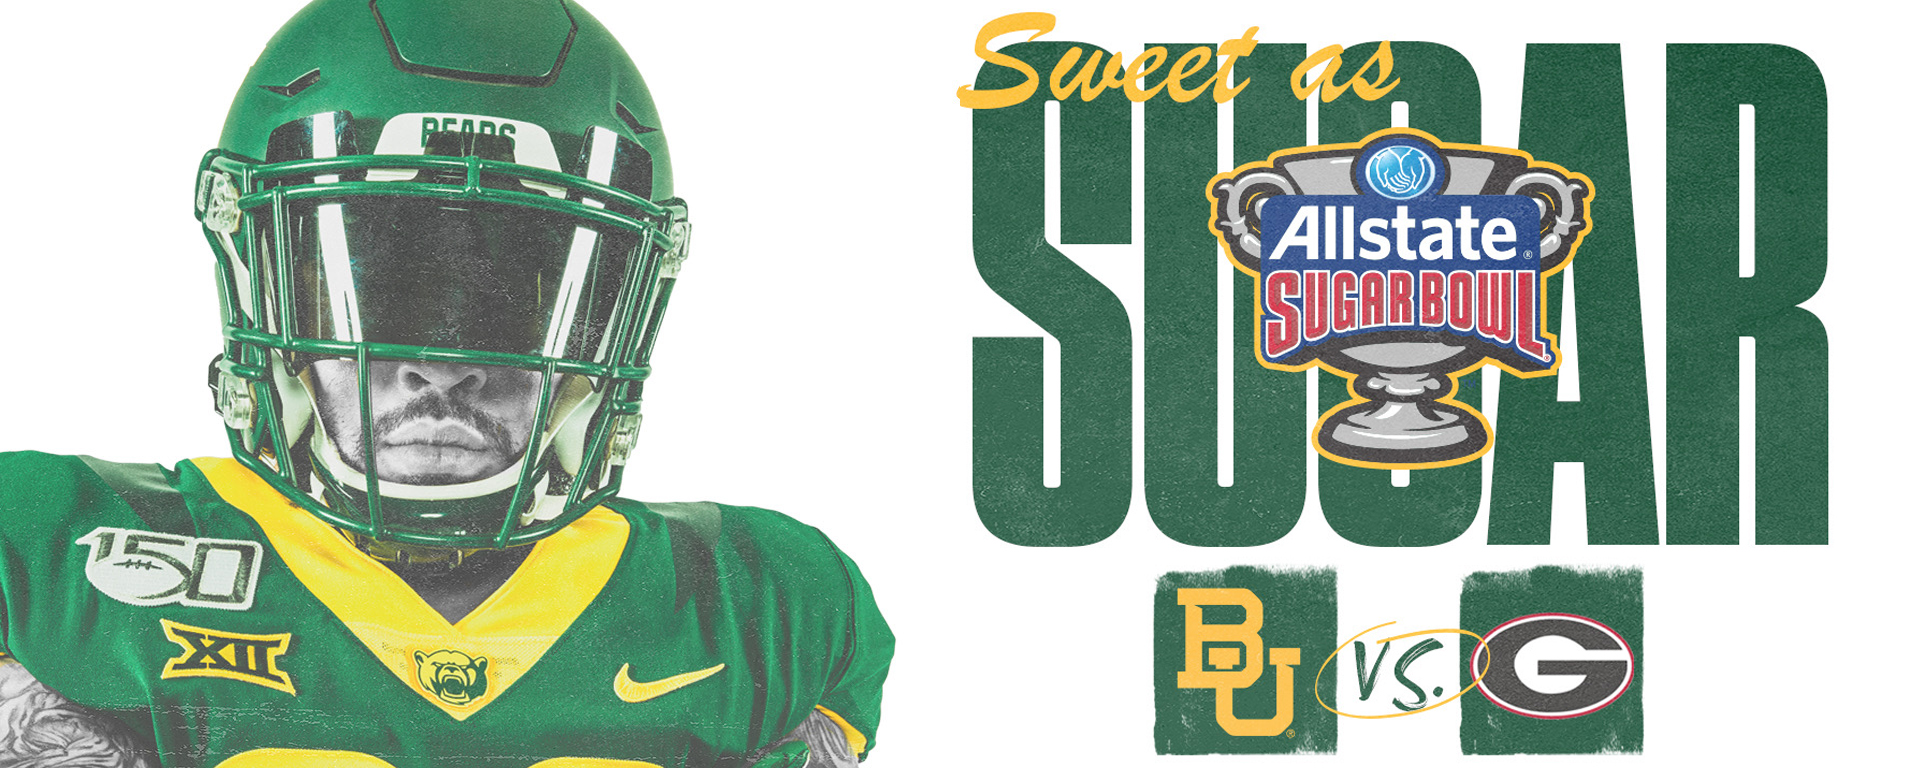 Allstate Sugar Bowl